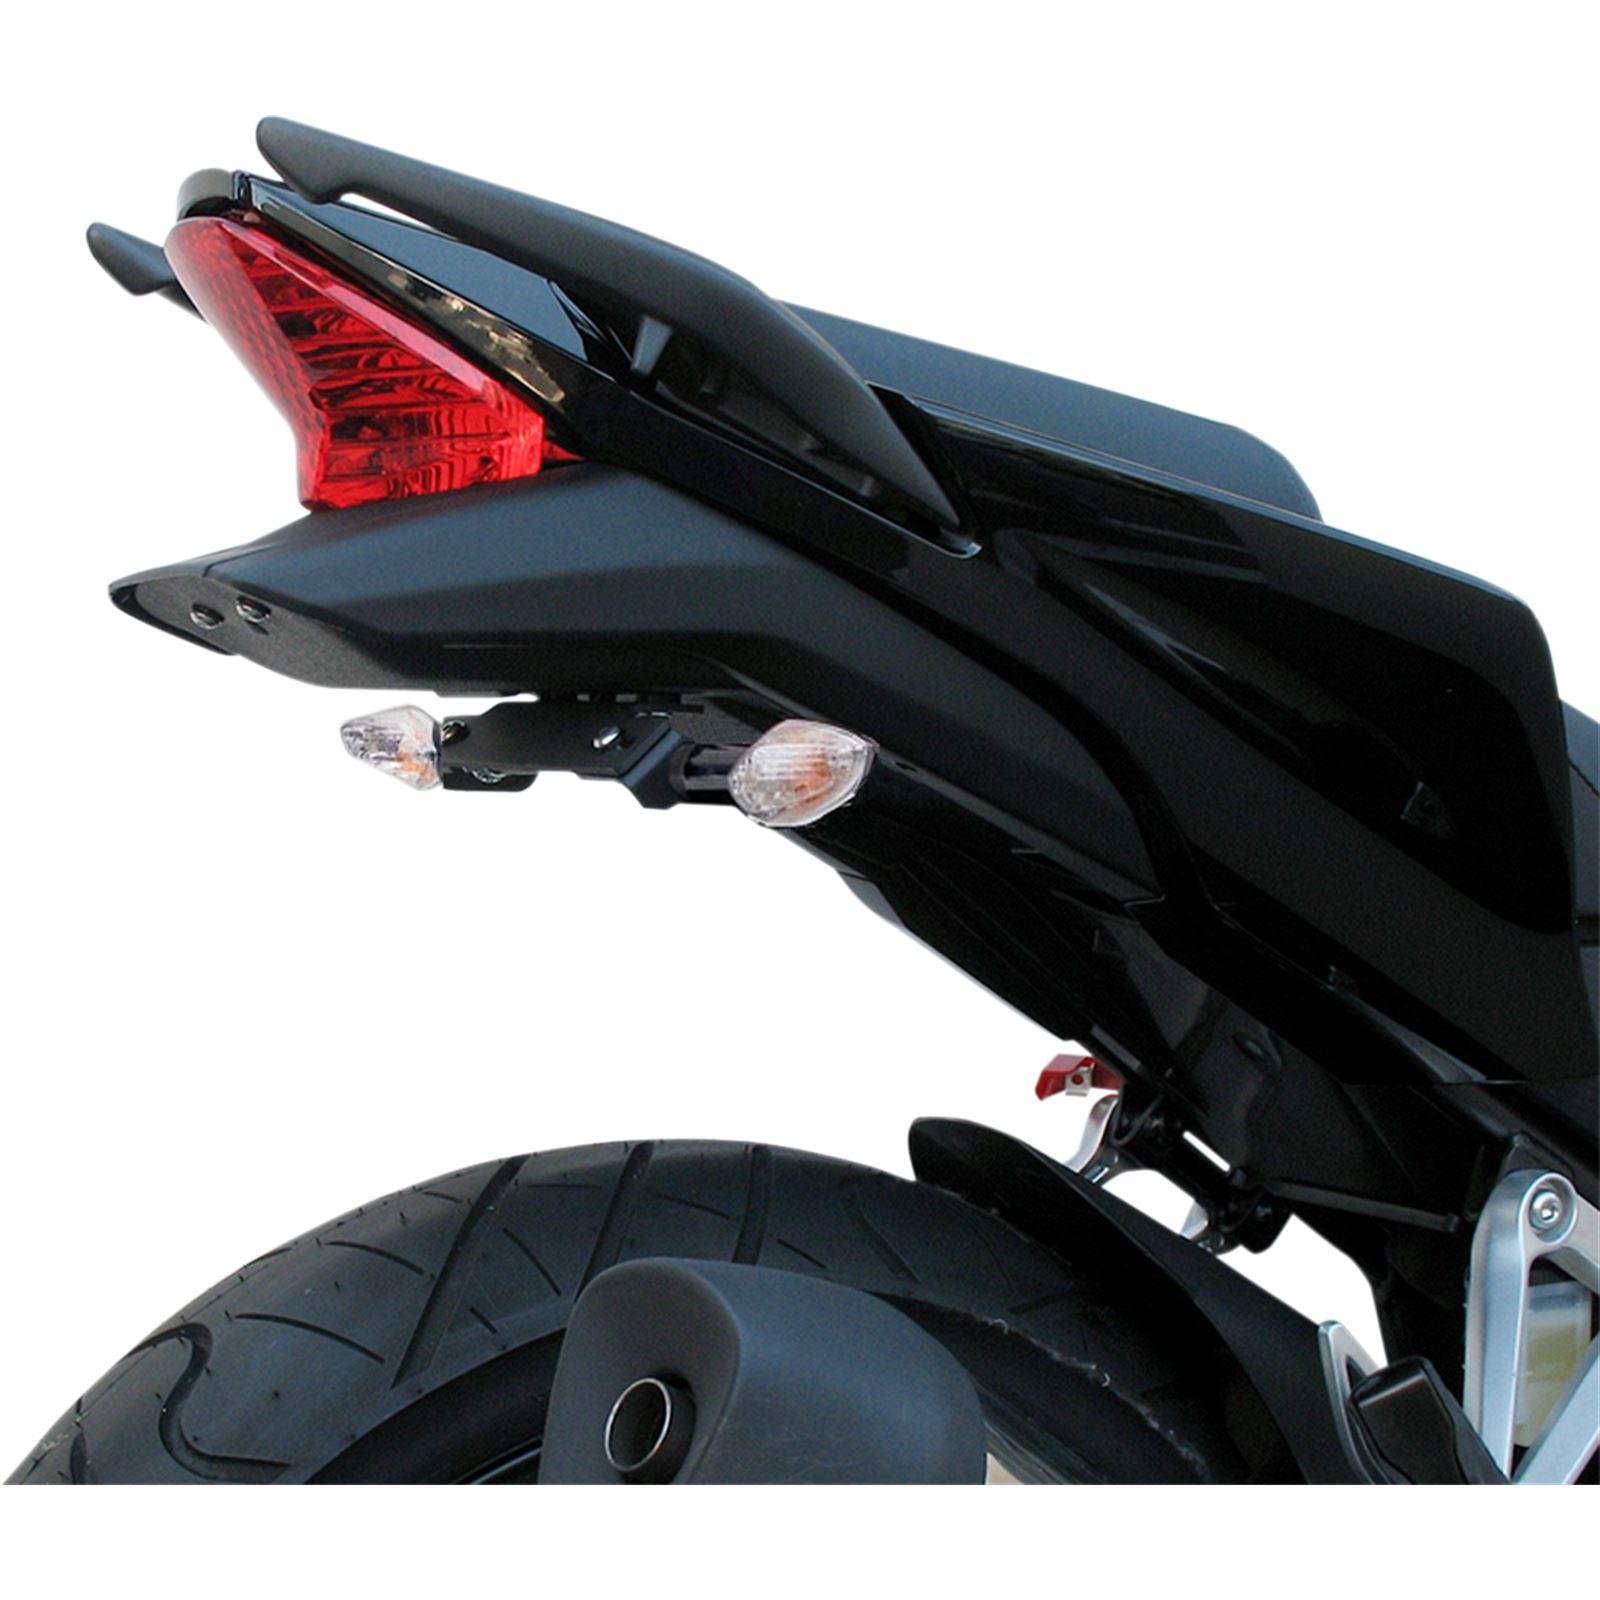 Targa X-Tail Kit - CBR300R Full Fairing